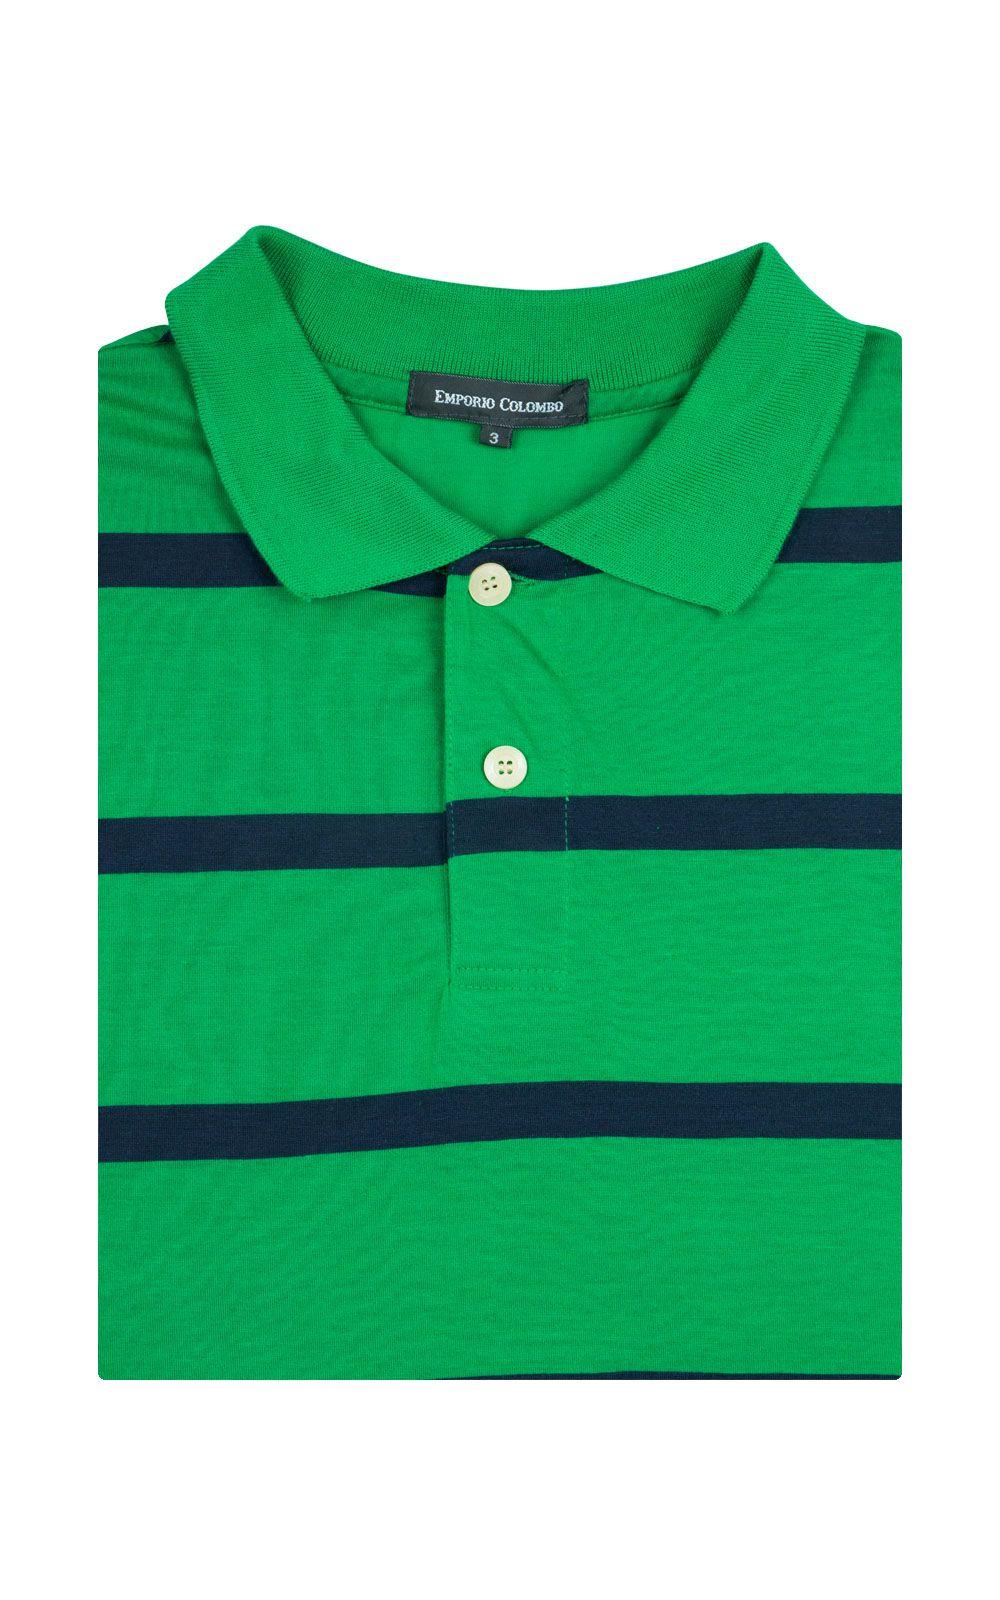 Foto 4 - Camisa Polo Masculina Verde Listrada